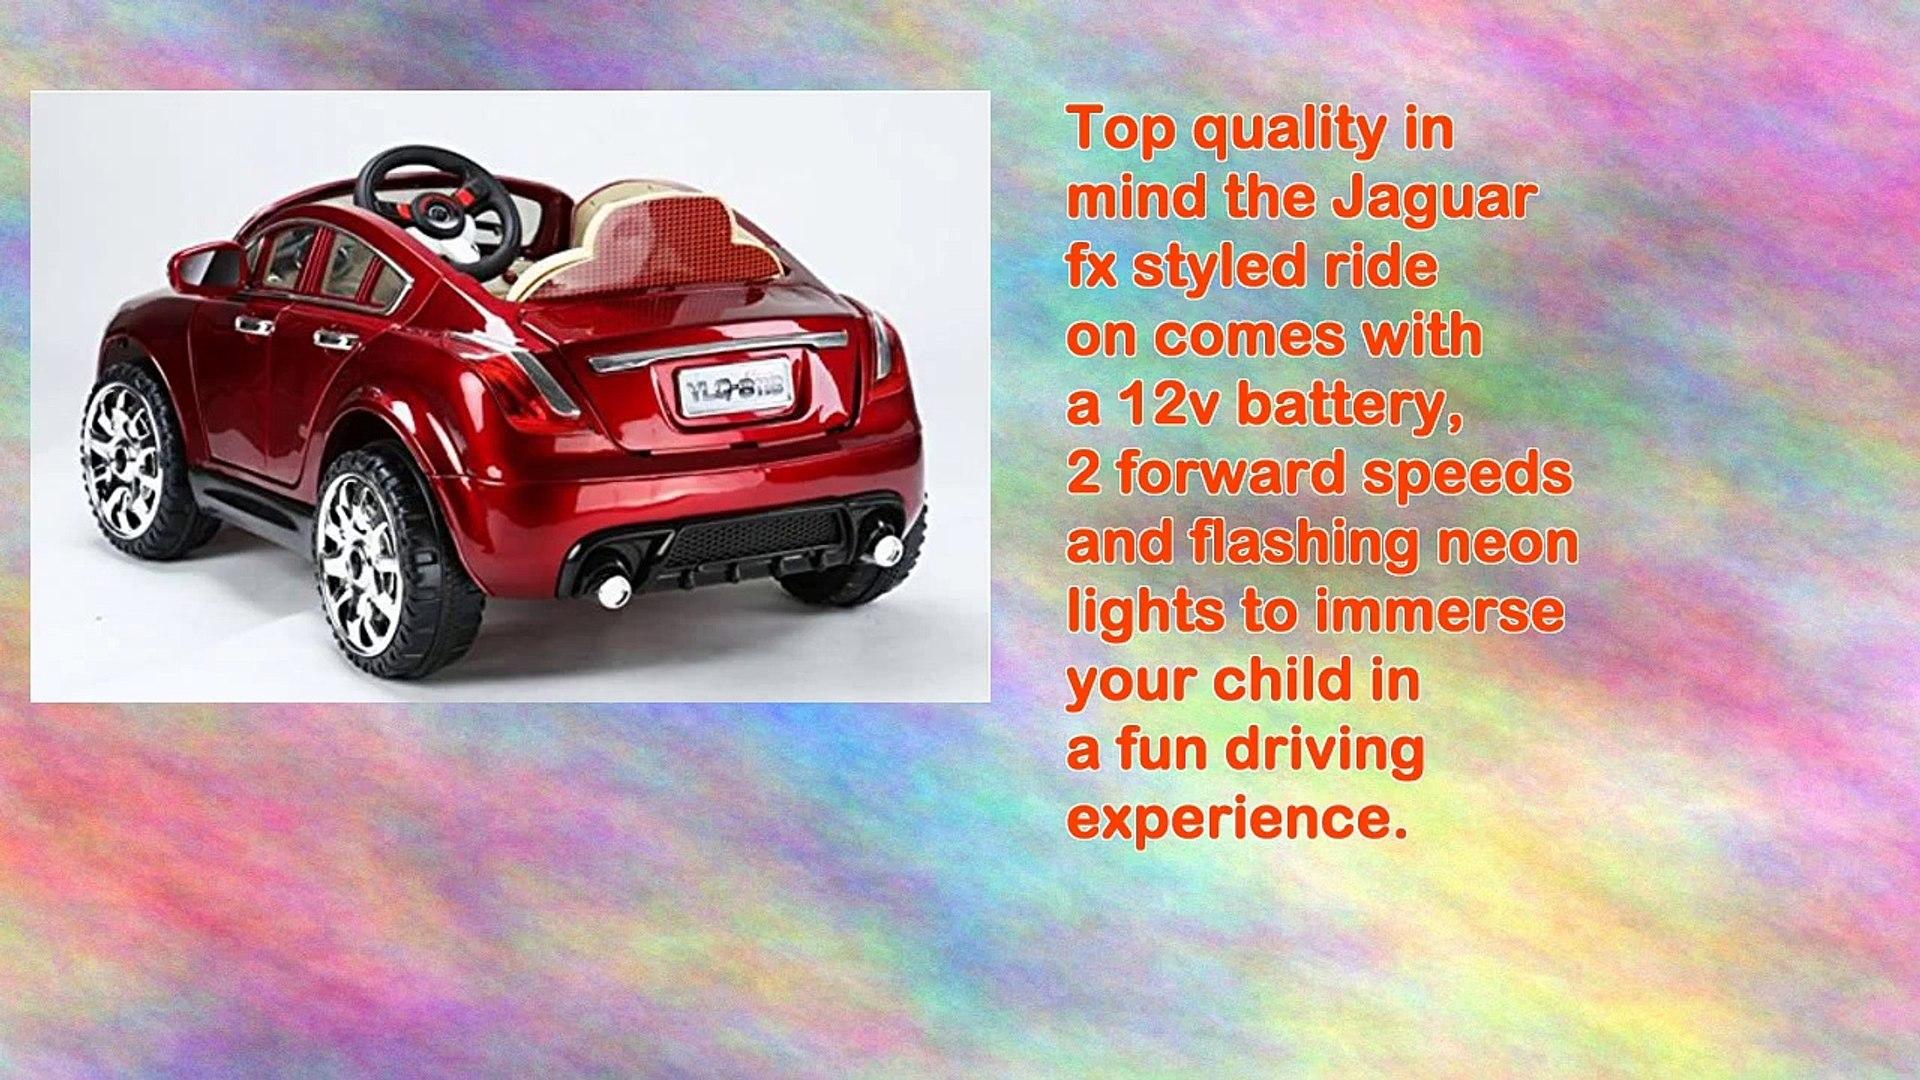 2015 Sport Edition Jaguar Fx Style Kids Ride on Car